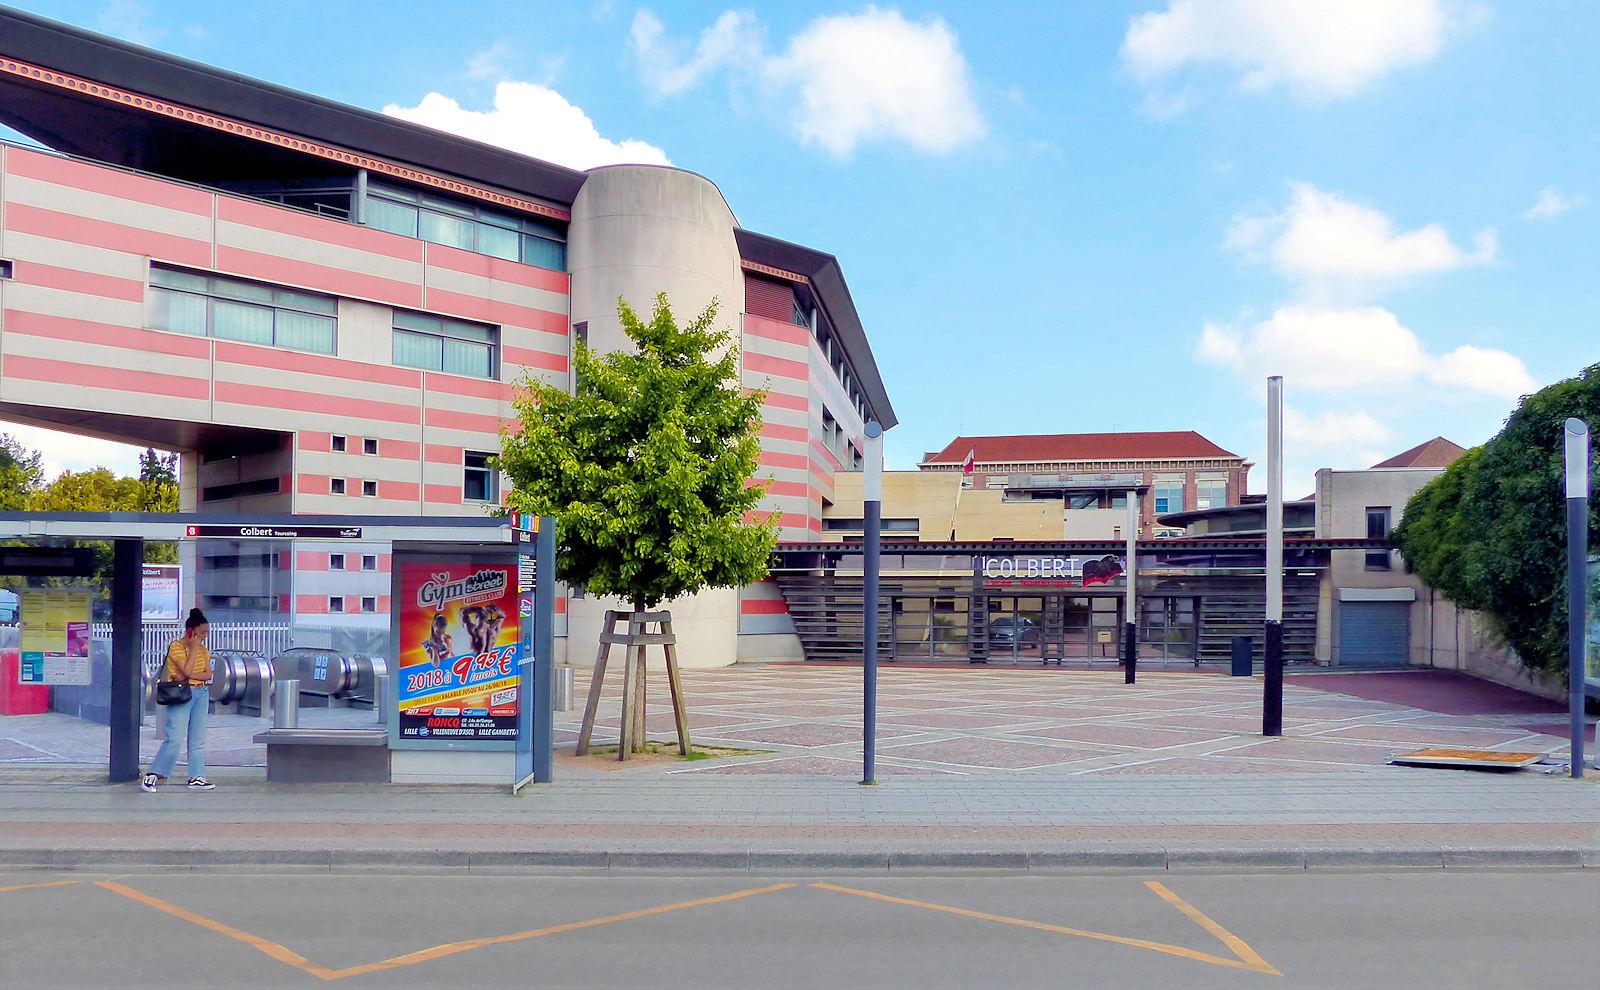 Tourcoing Lycées - Lycée public COLBERT